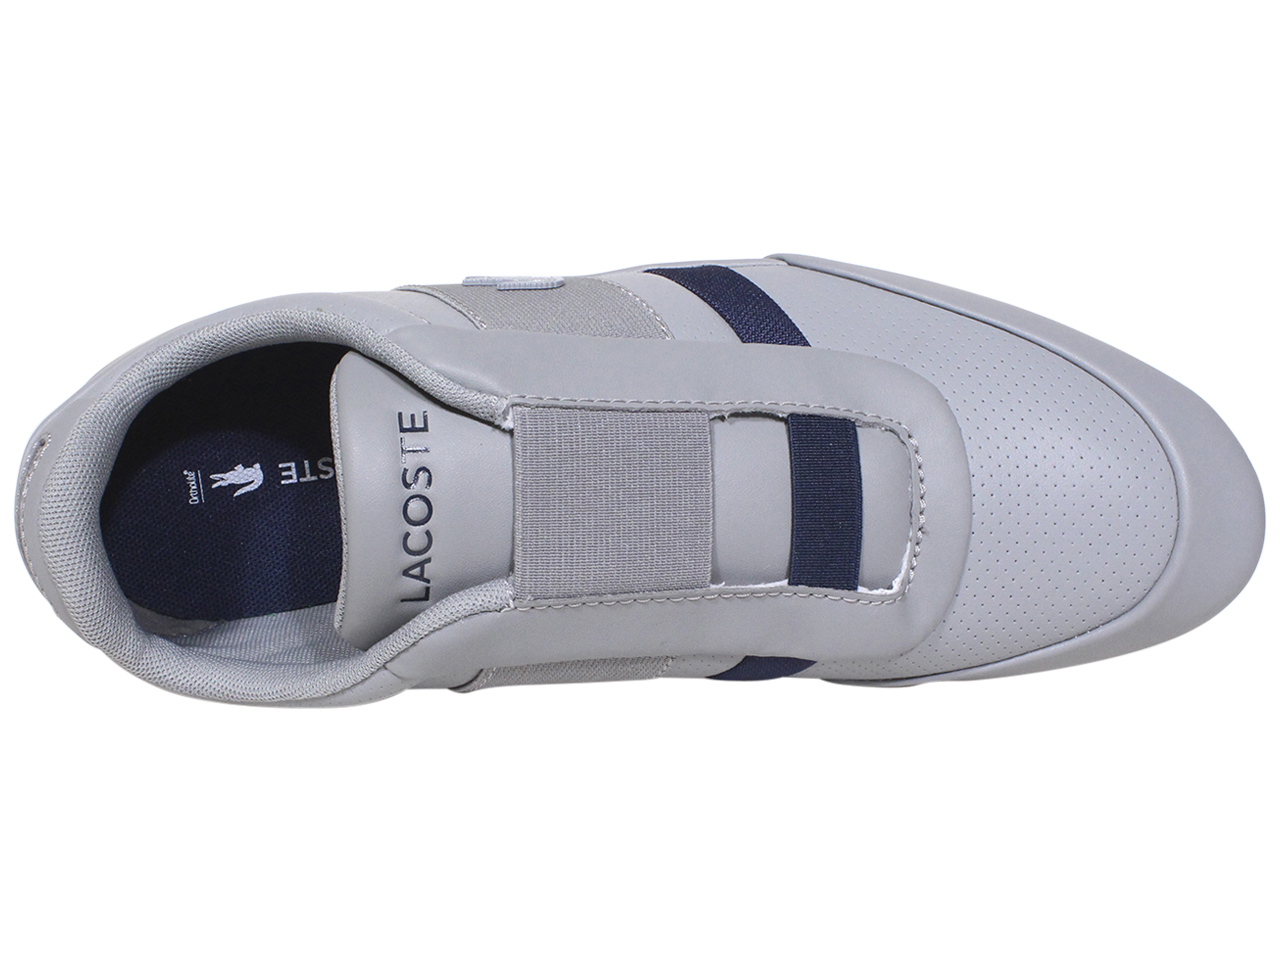 Lacoste-Misano-Elastic-318-Sneakers-Men-039-s-Low-Top-Shoes thumbnail 13